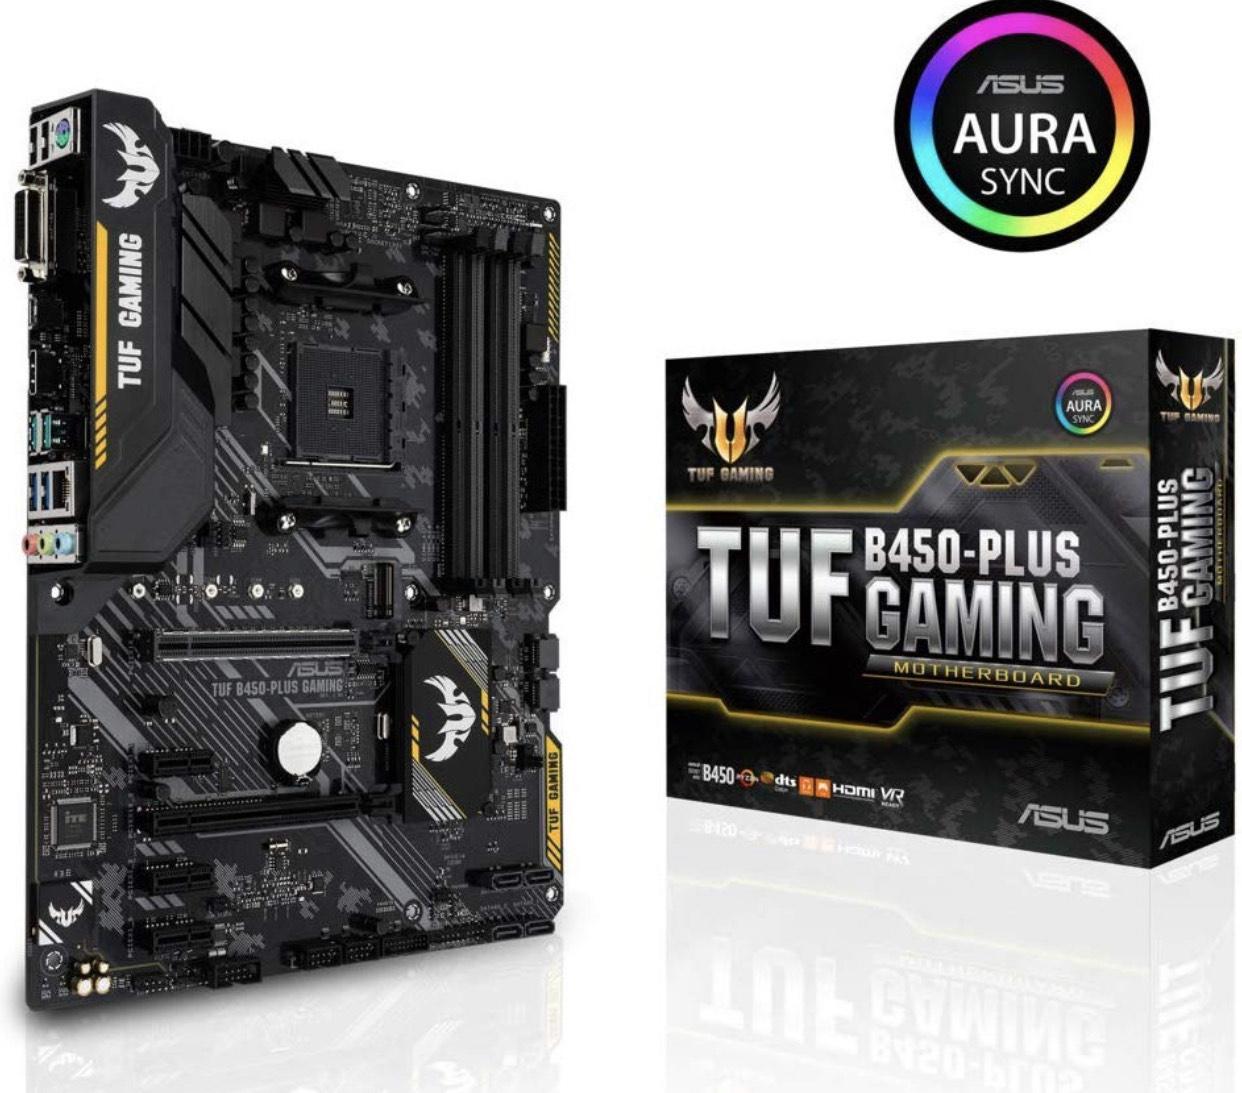 ASUS TUF B450-Plus Gaming Mainboard (90MB0YM0-M0EAY0)